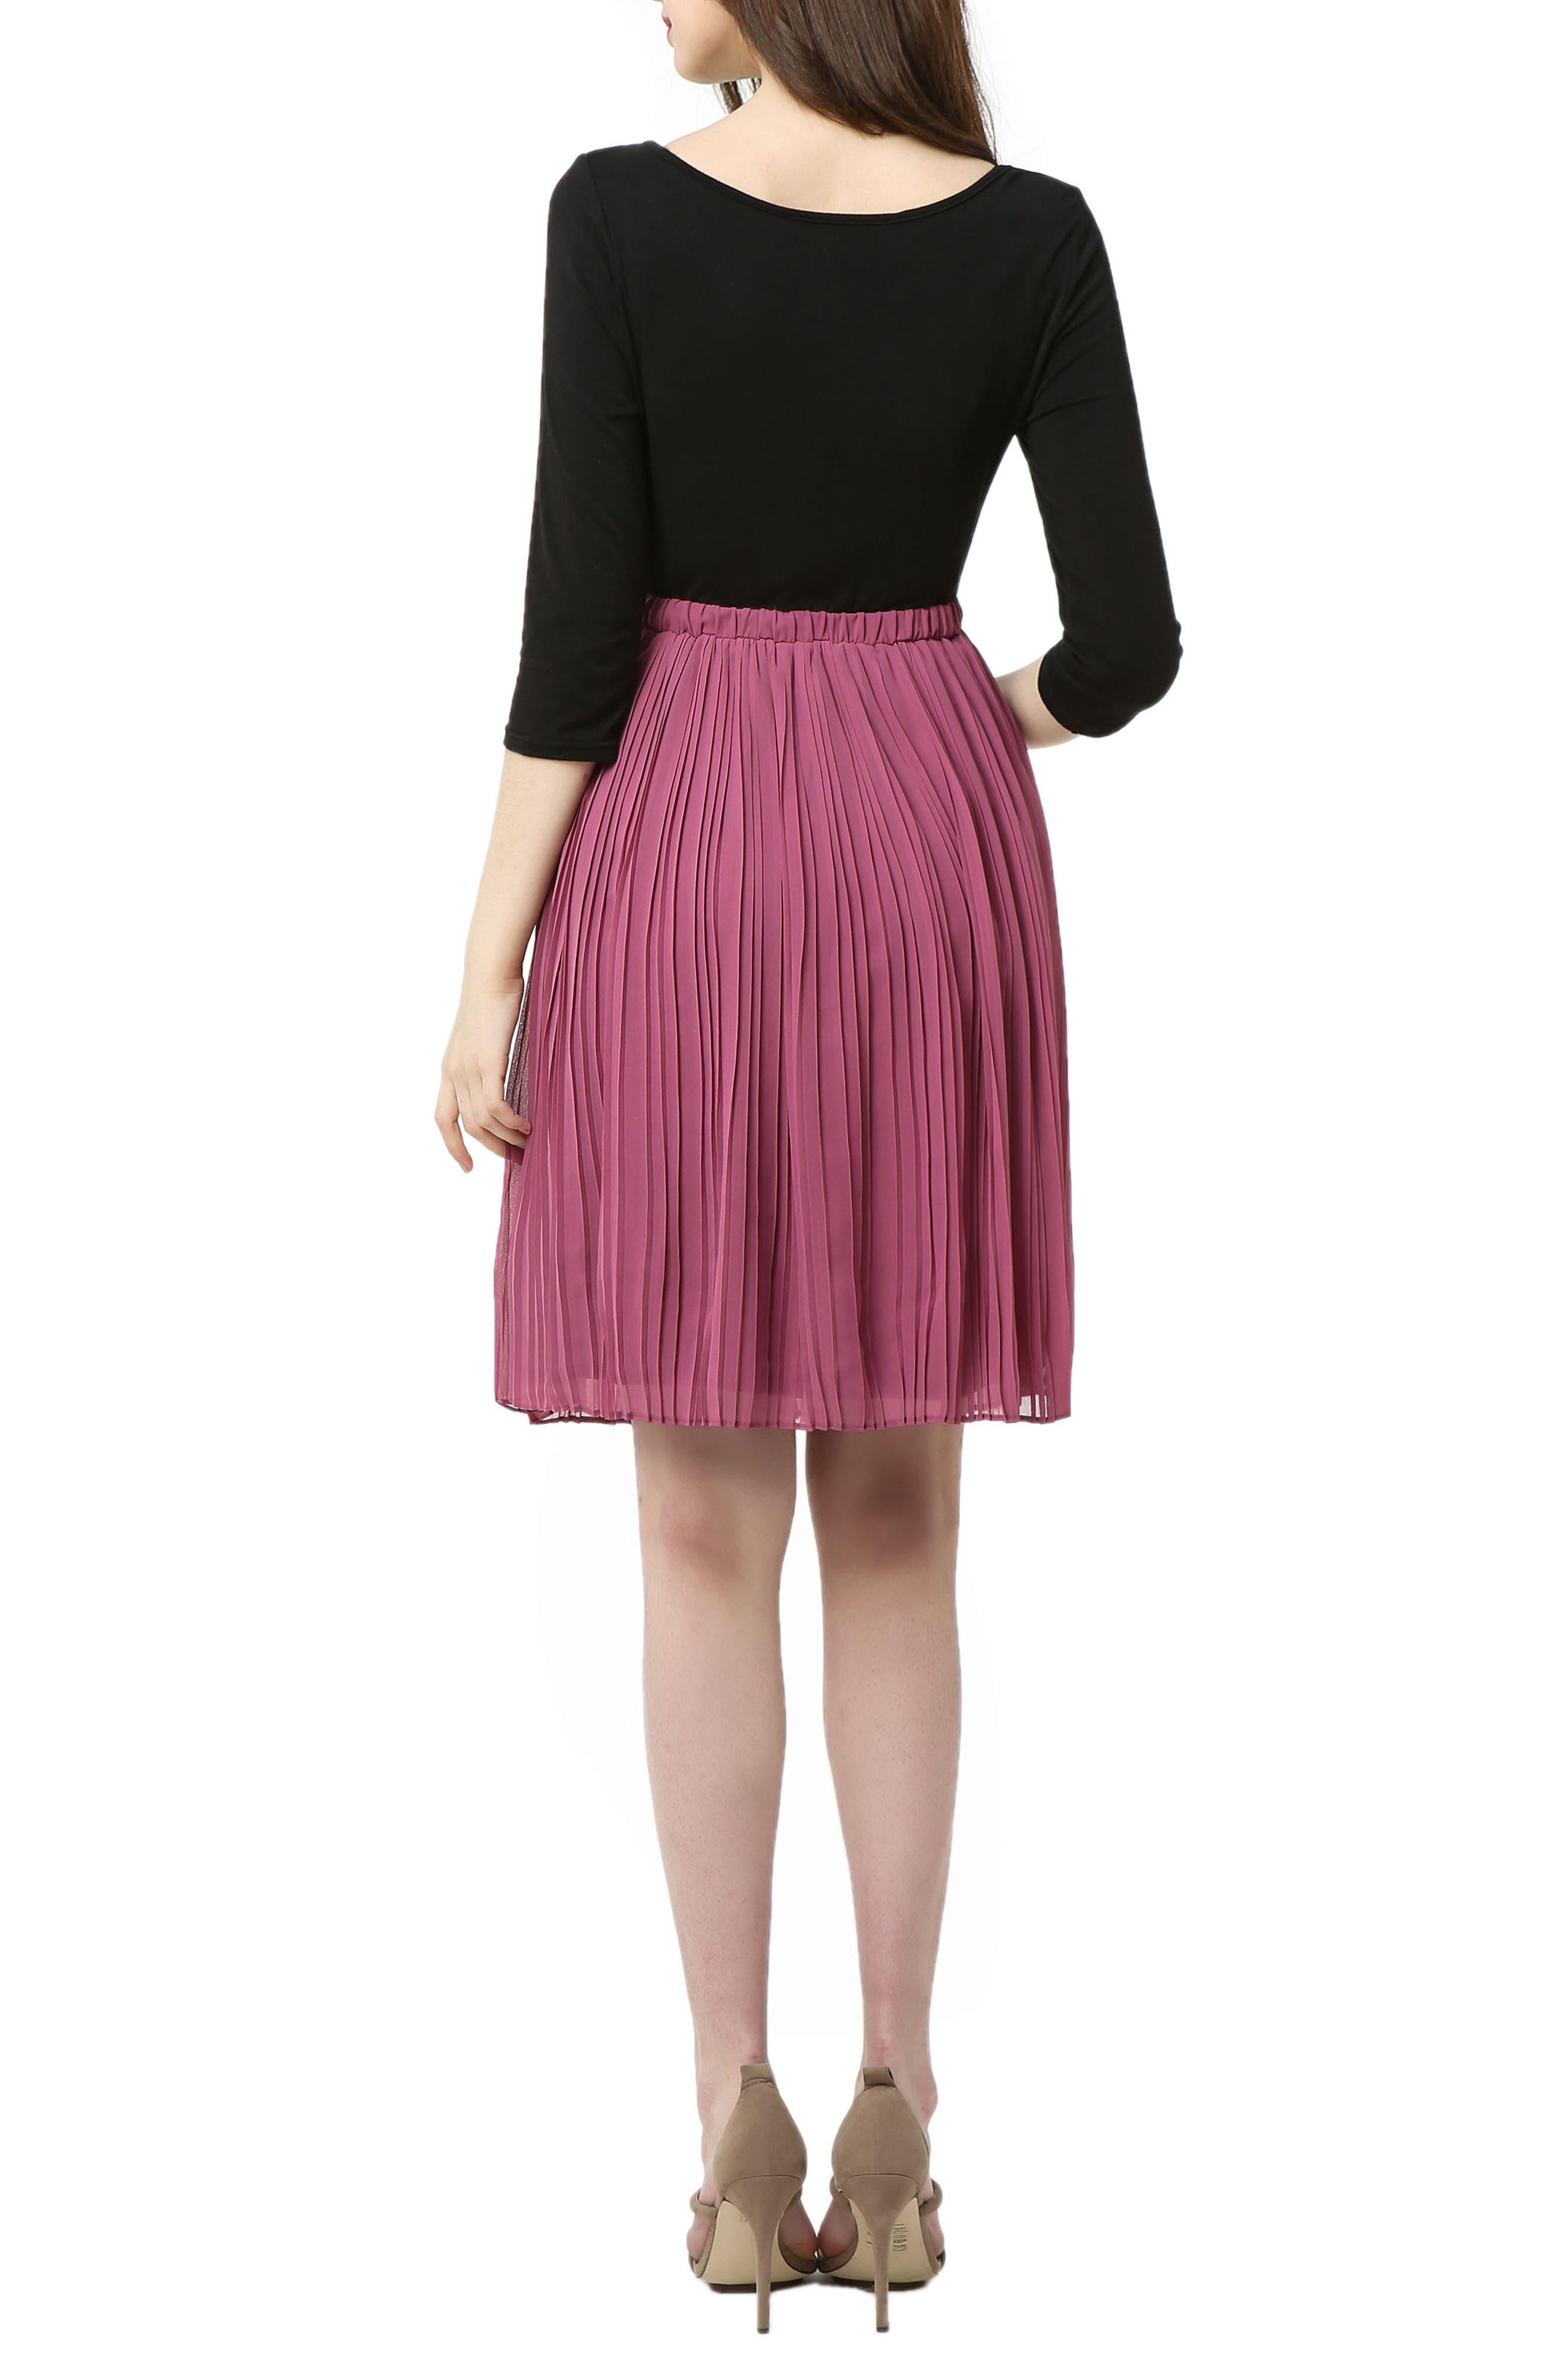 Marie Colorblock Pleat Skirt Maternity Dress,                             Alternate thumbnail 2, color,                             Black